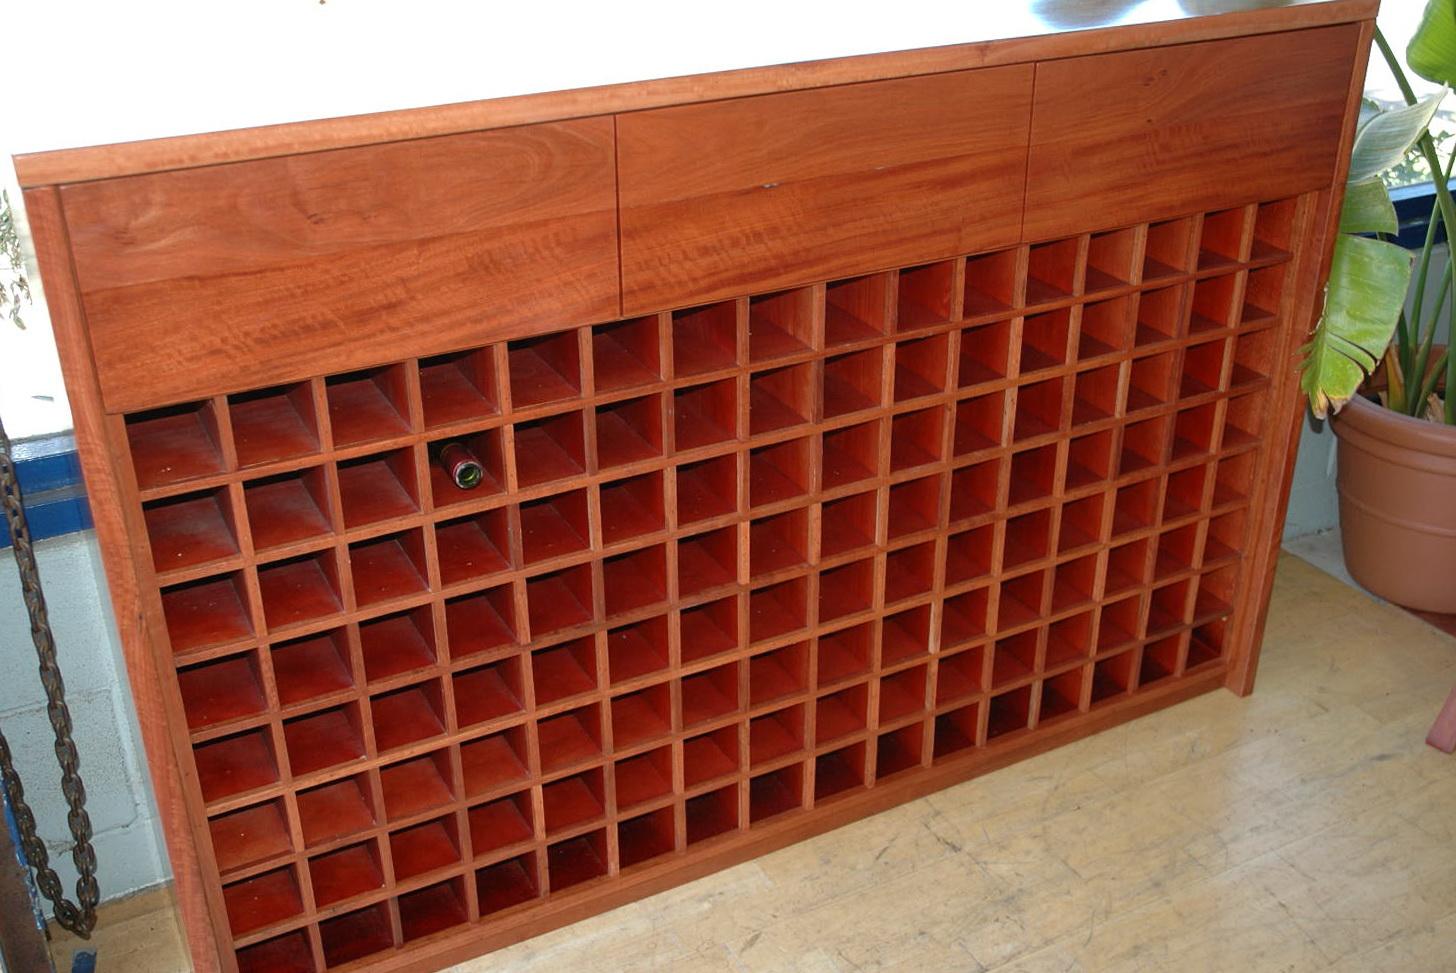 Permalink to Wooden Wine Cellar Racks